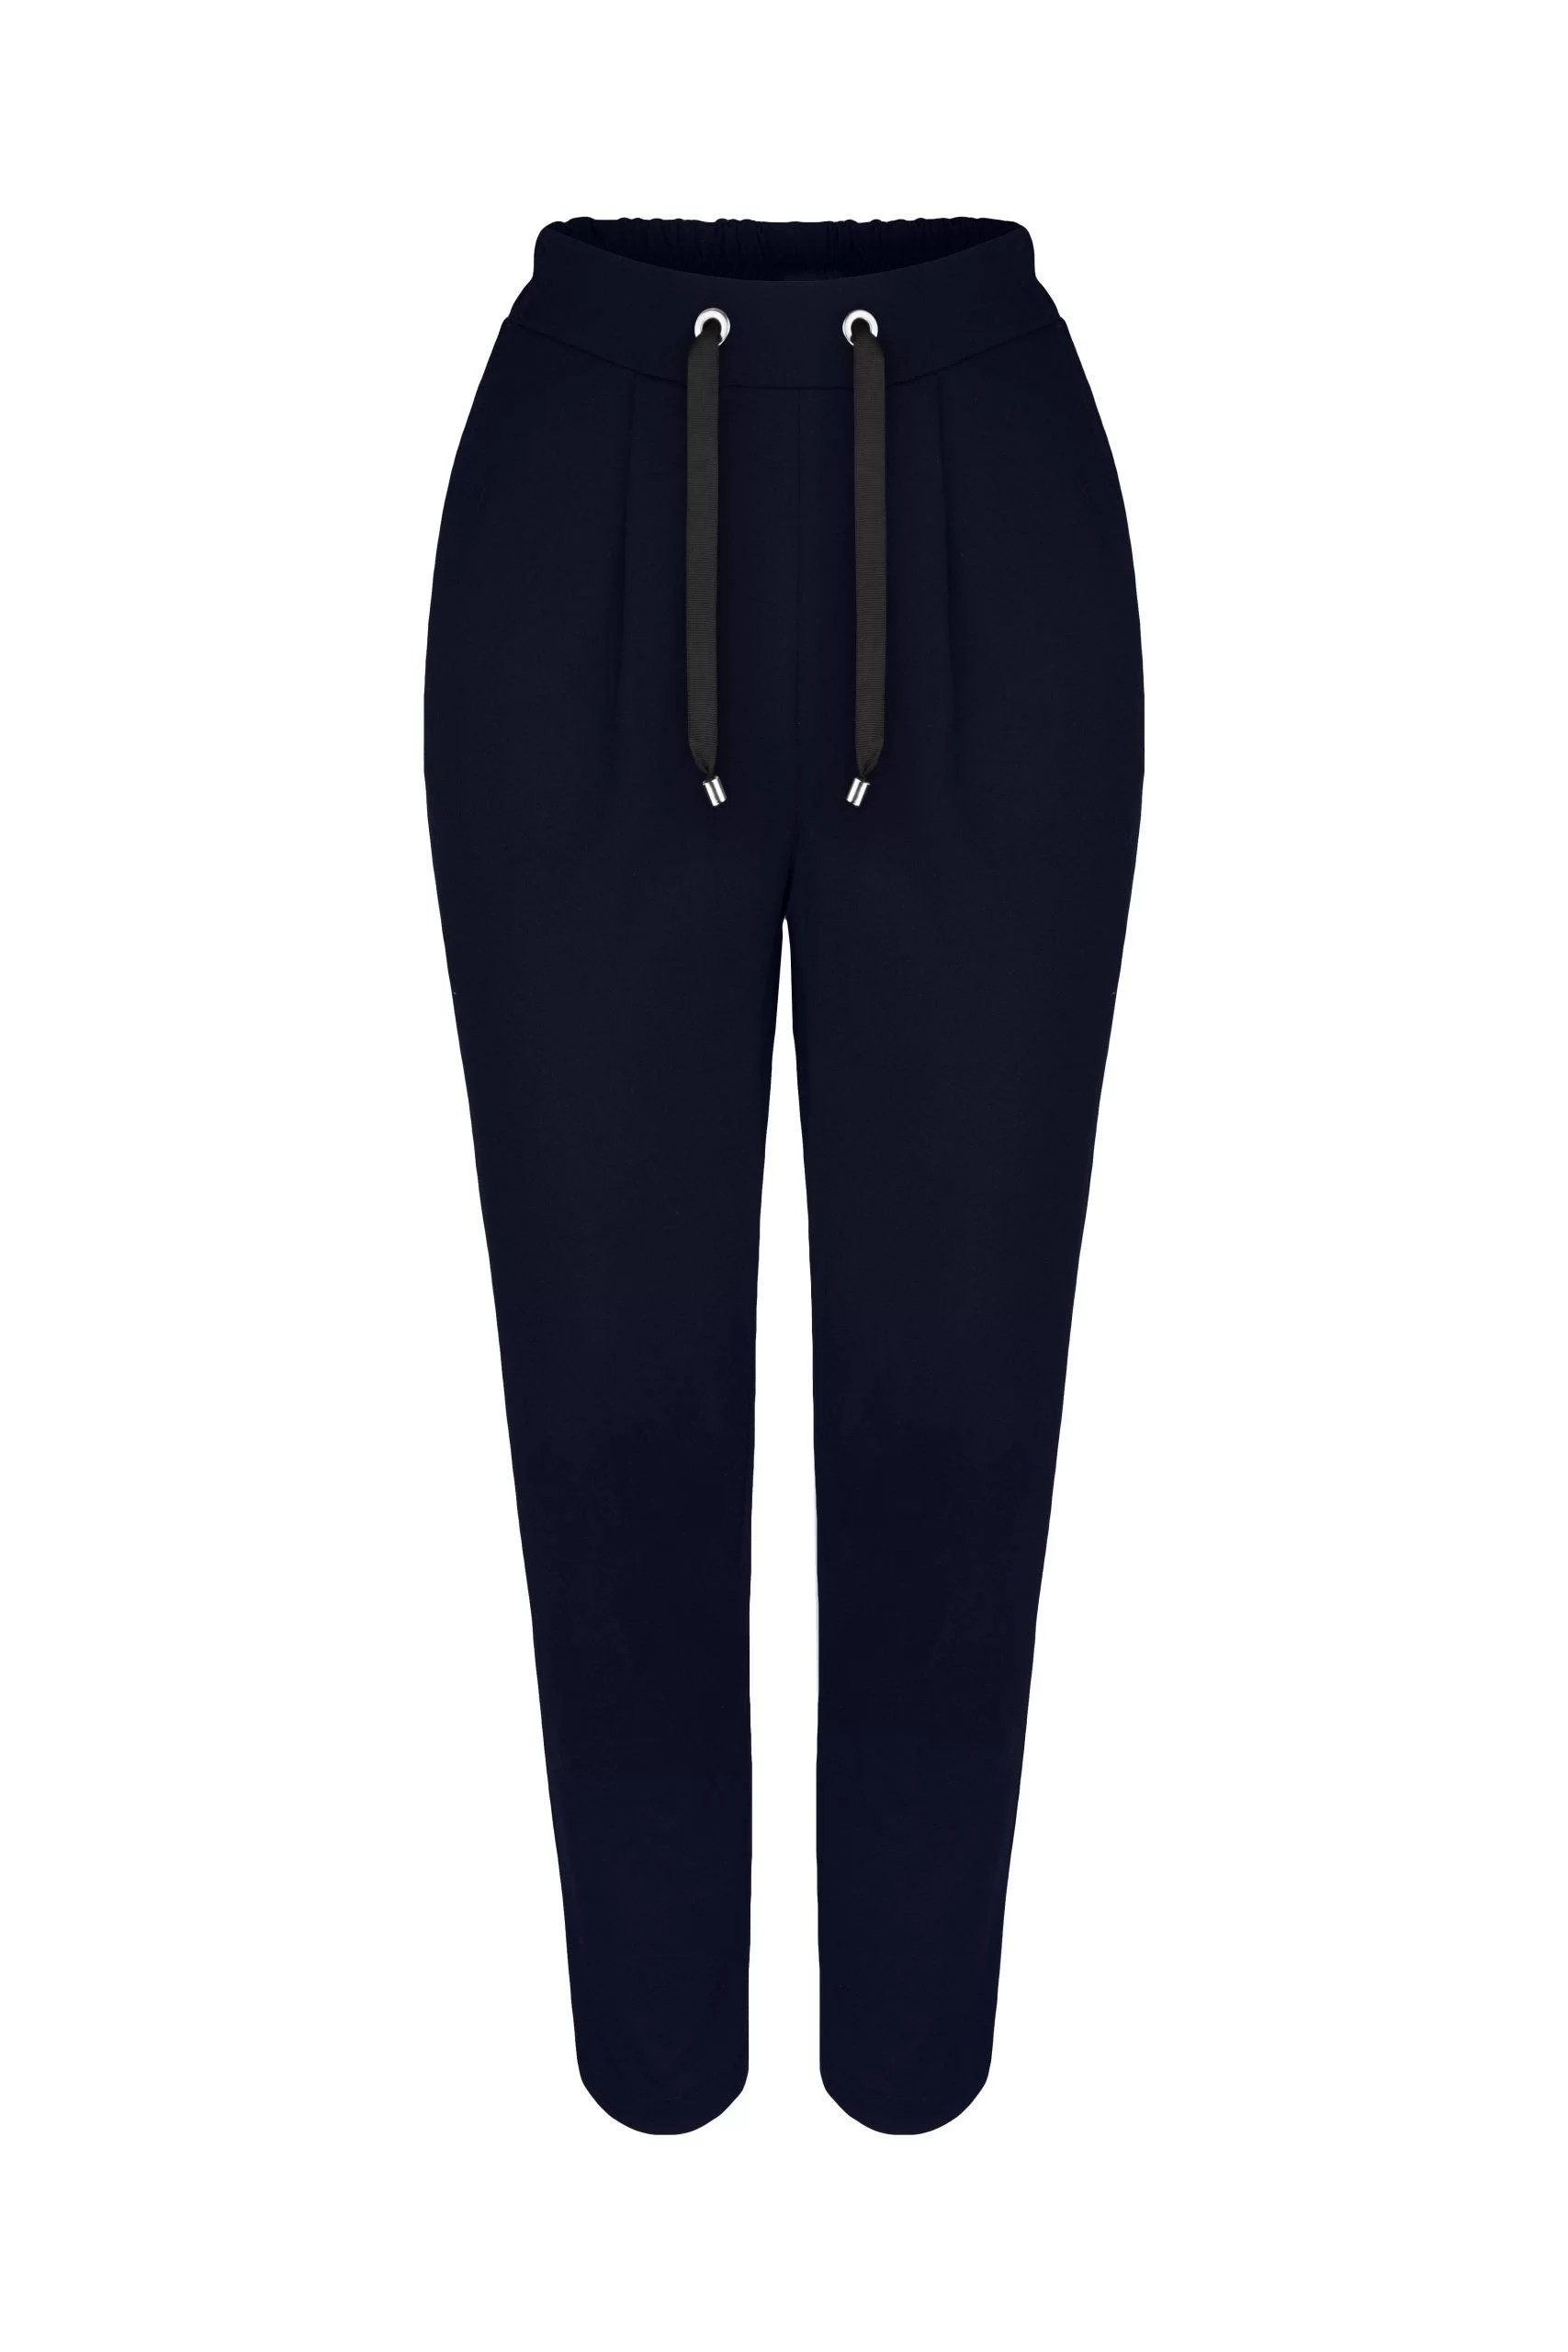 Spodnie Palermo Granatowe